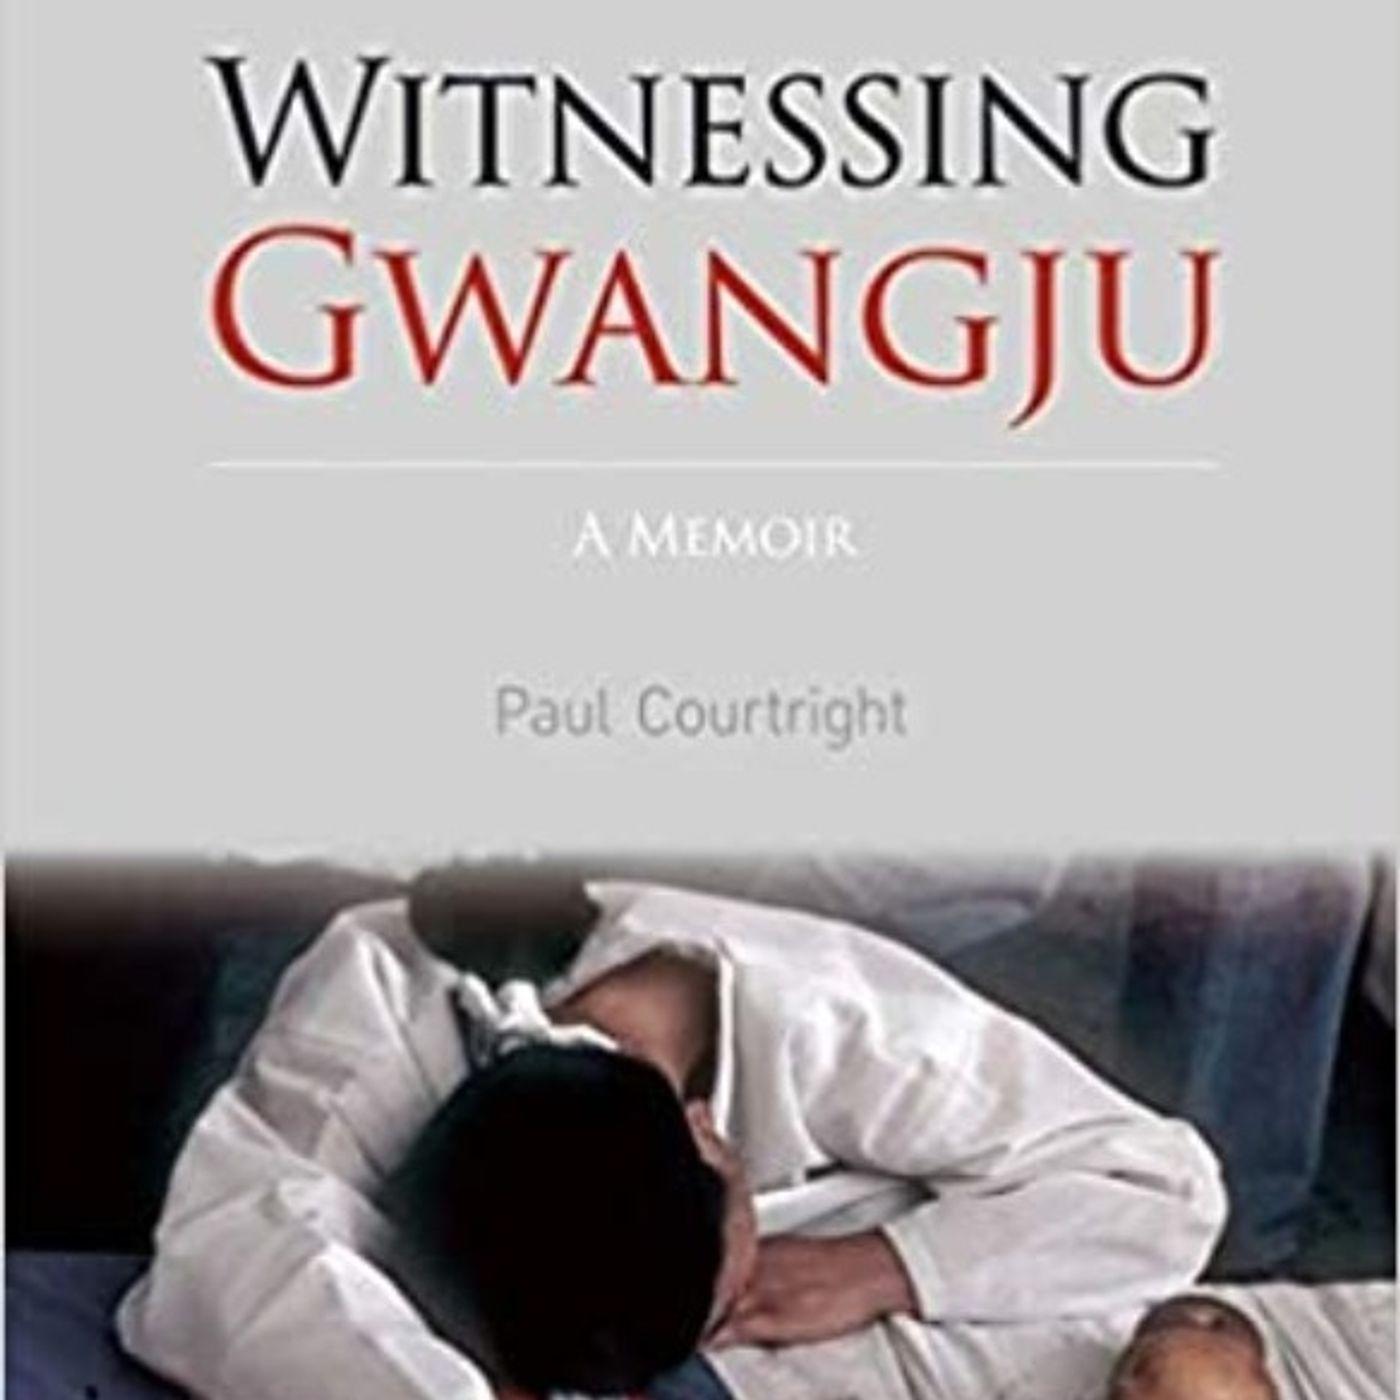 Witnessing Gwangju: A Memoir (w/ author Paul Courtright)